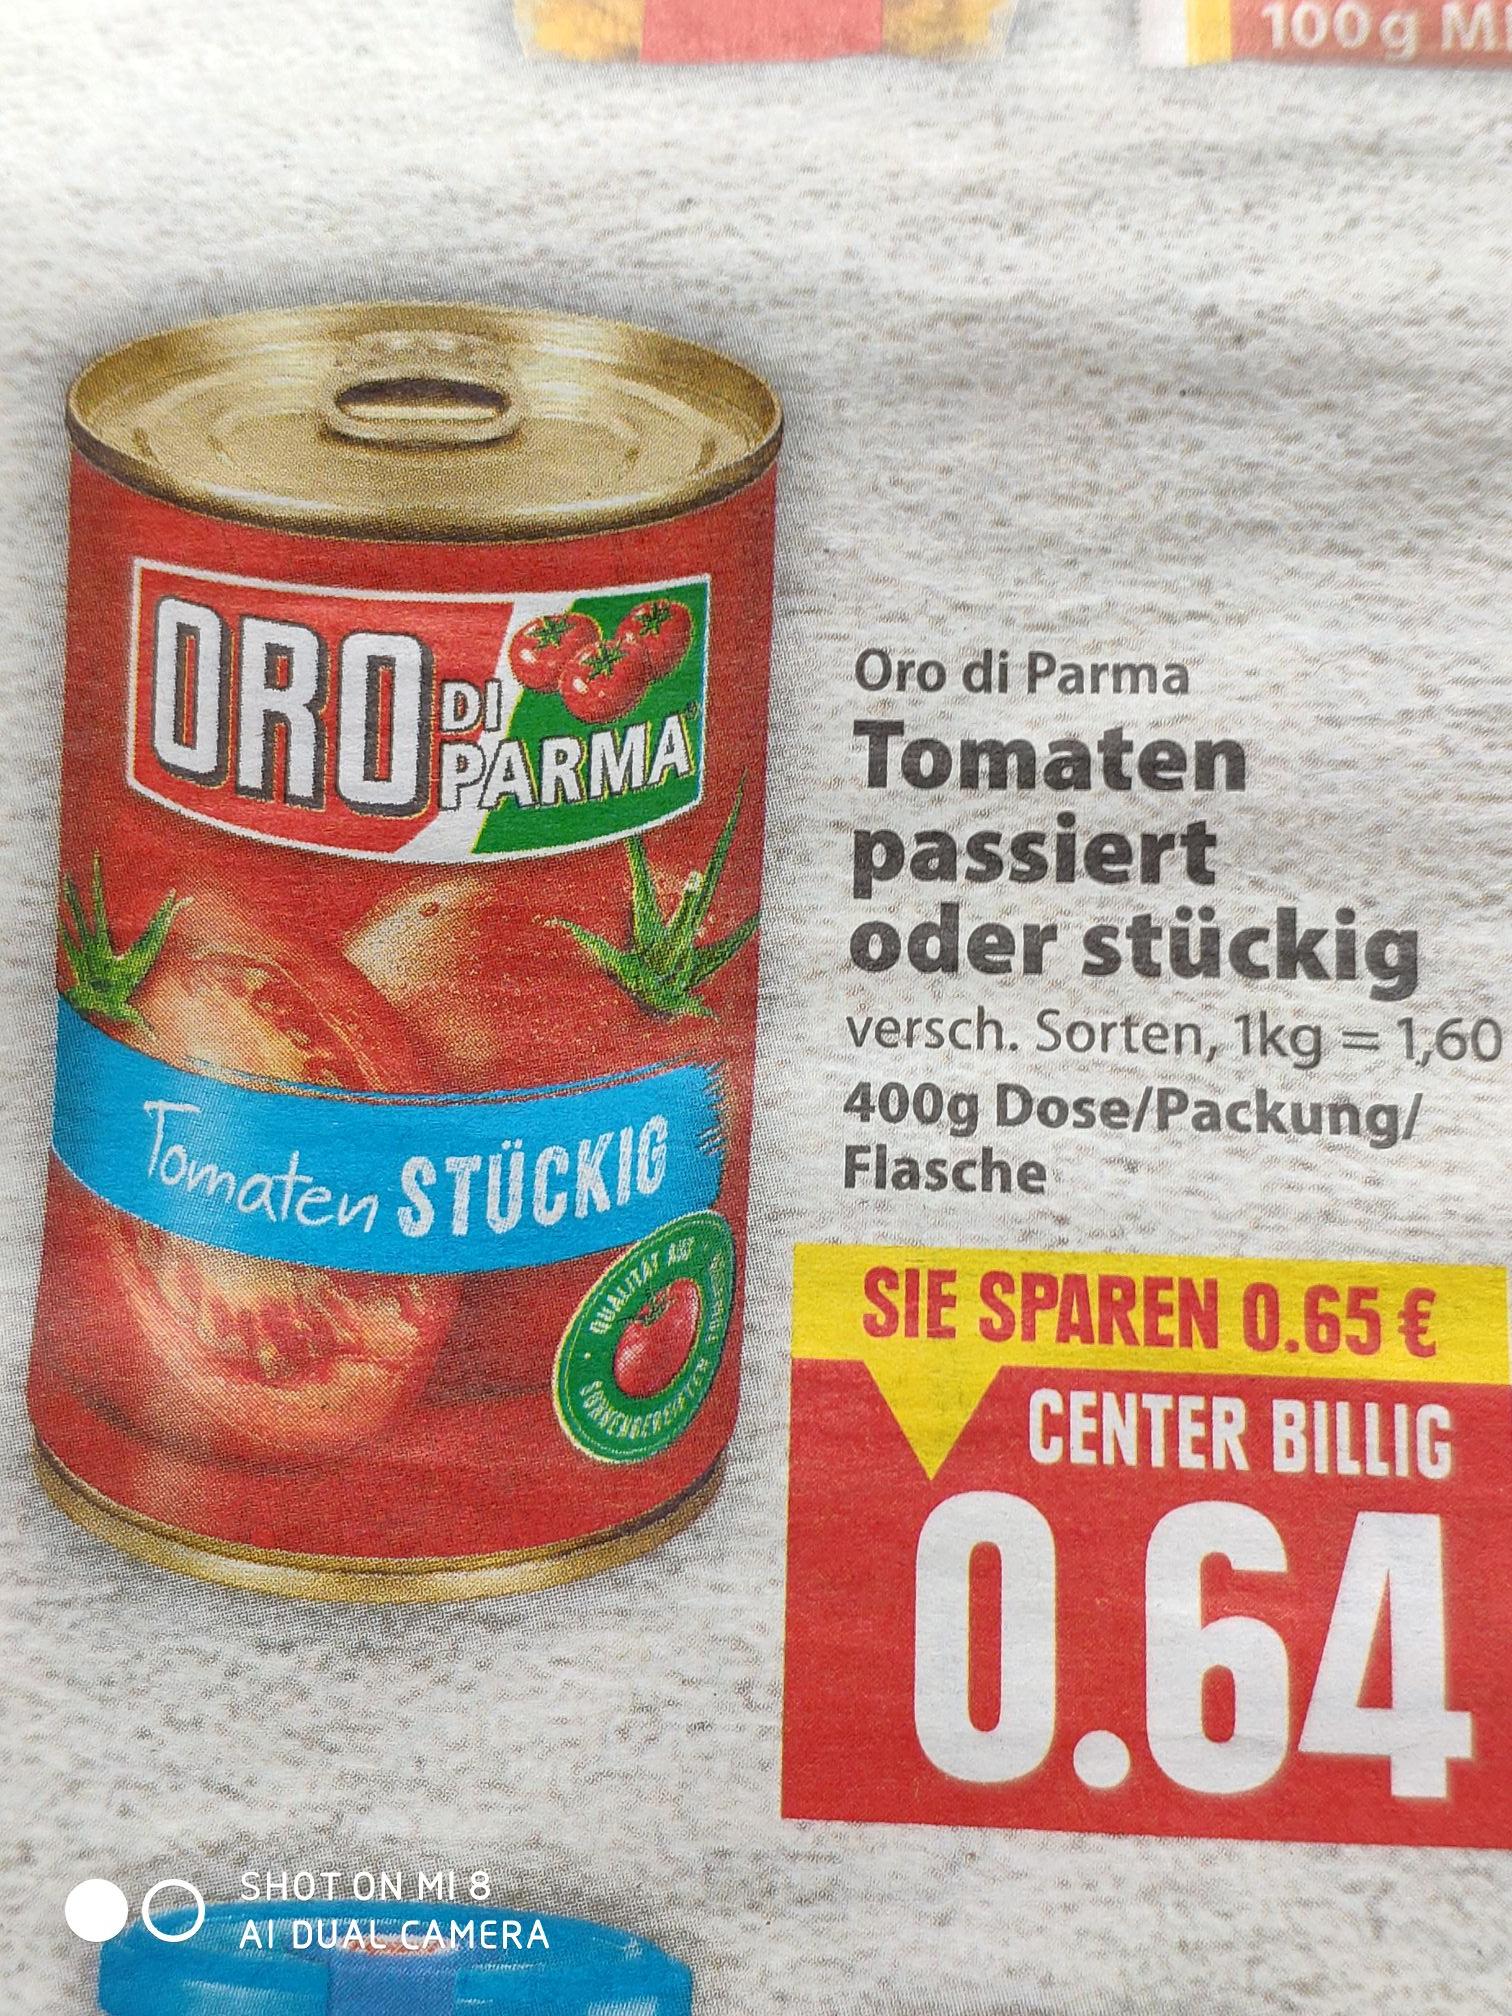 [E-Center Herford evtl. Bundesweit] Oro di Parma Tomaten 400g Dose